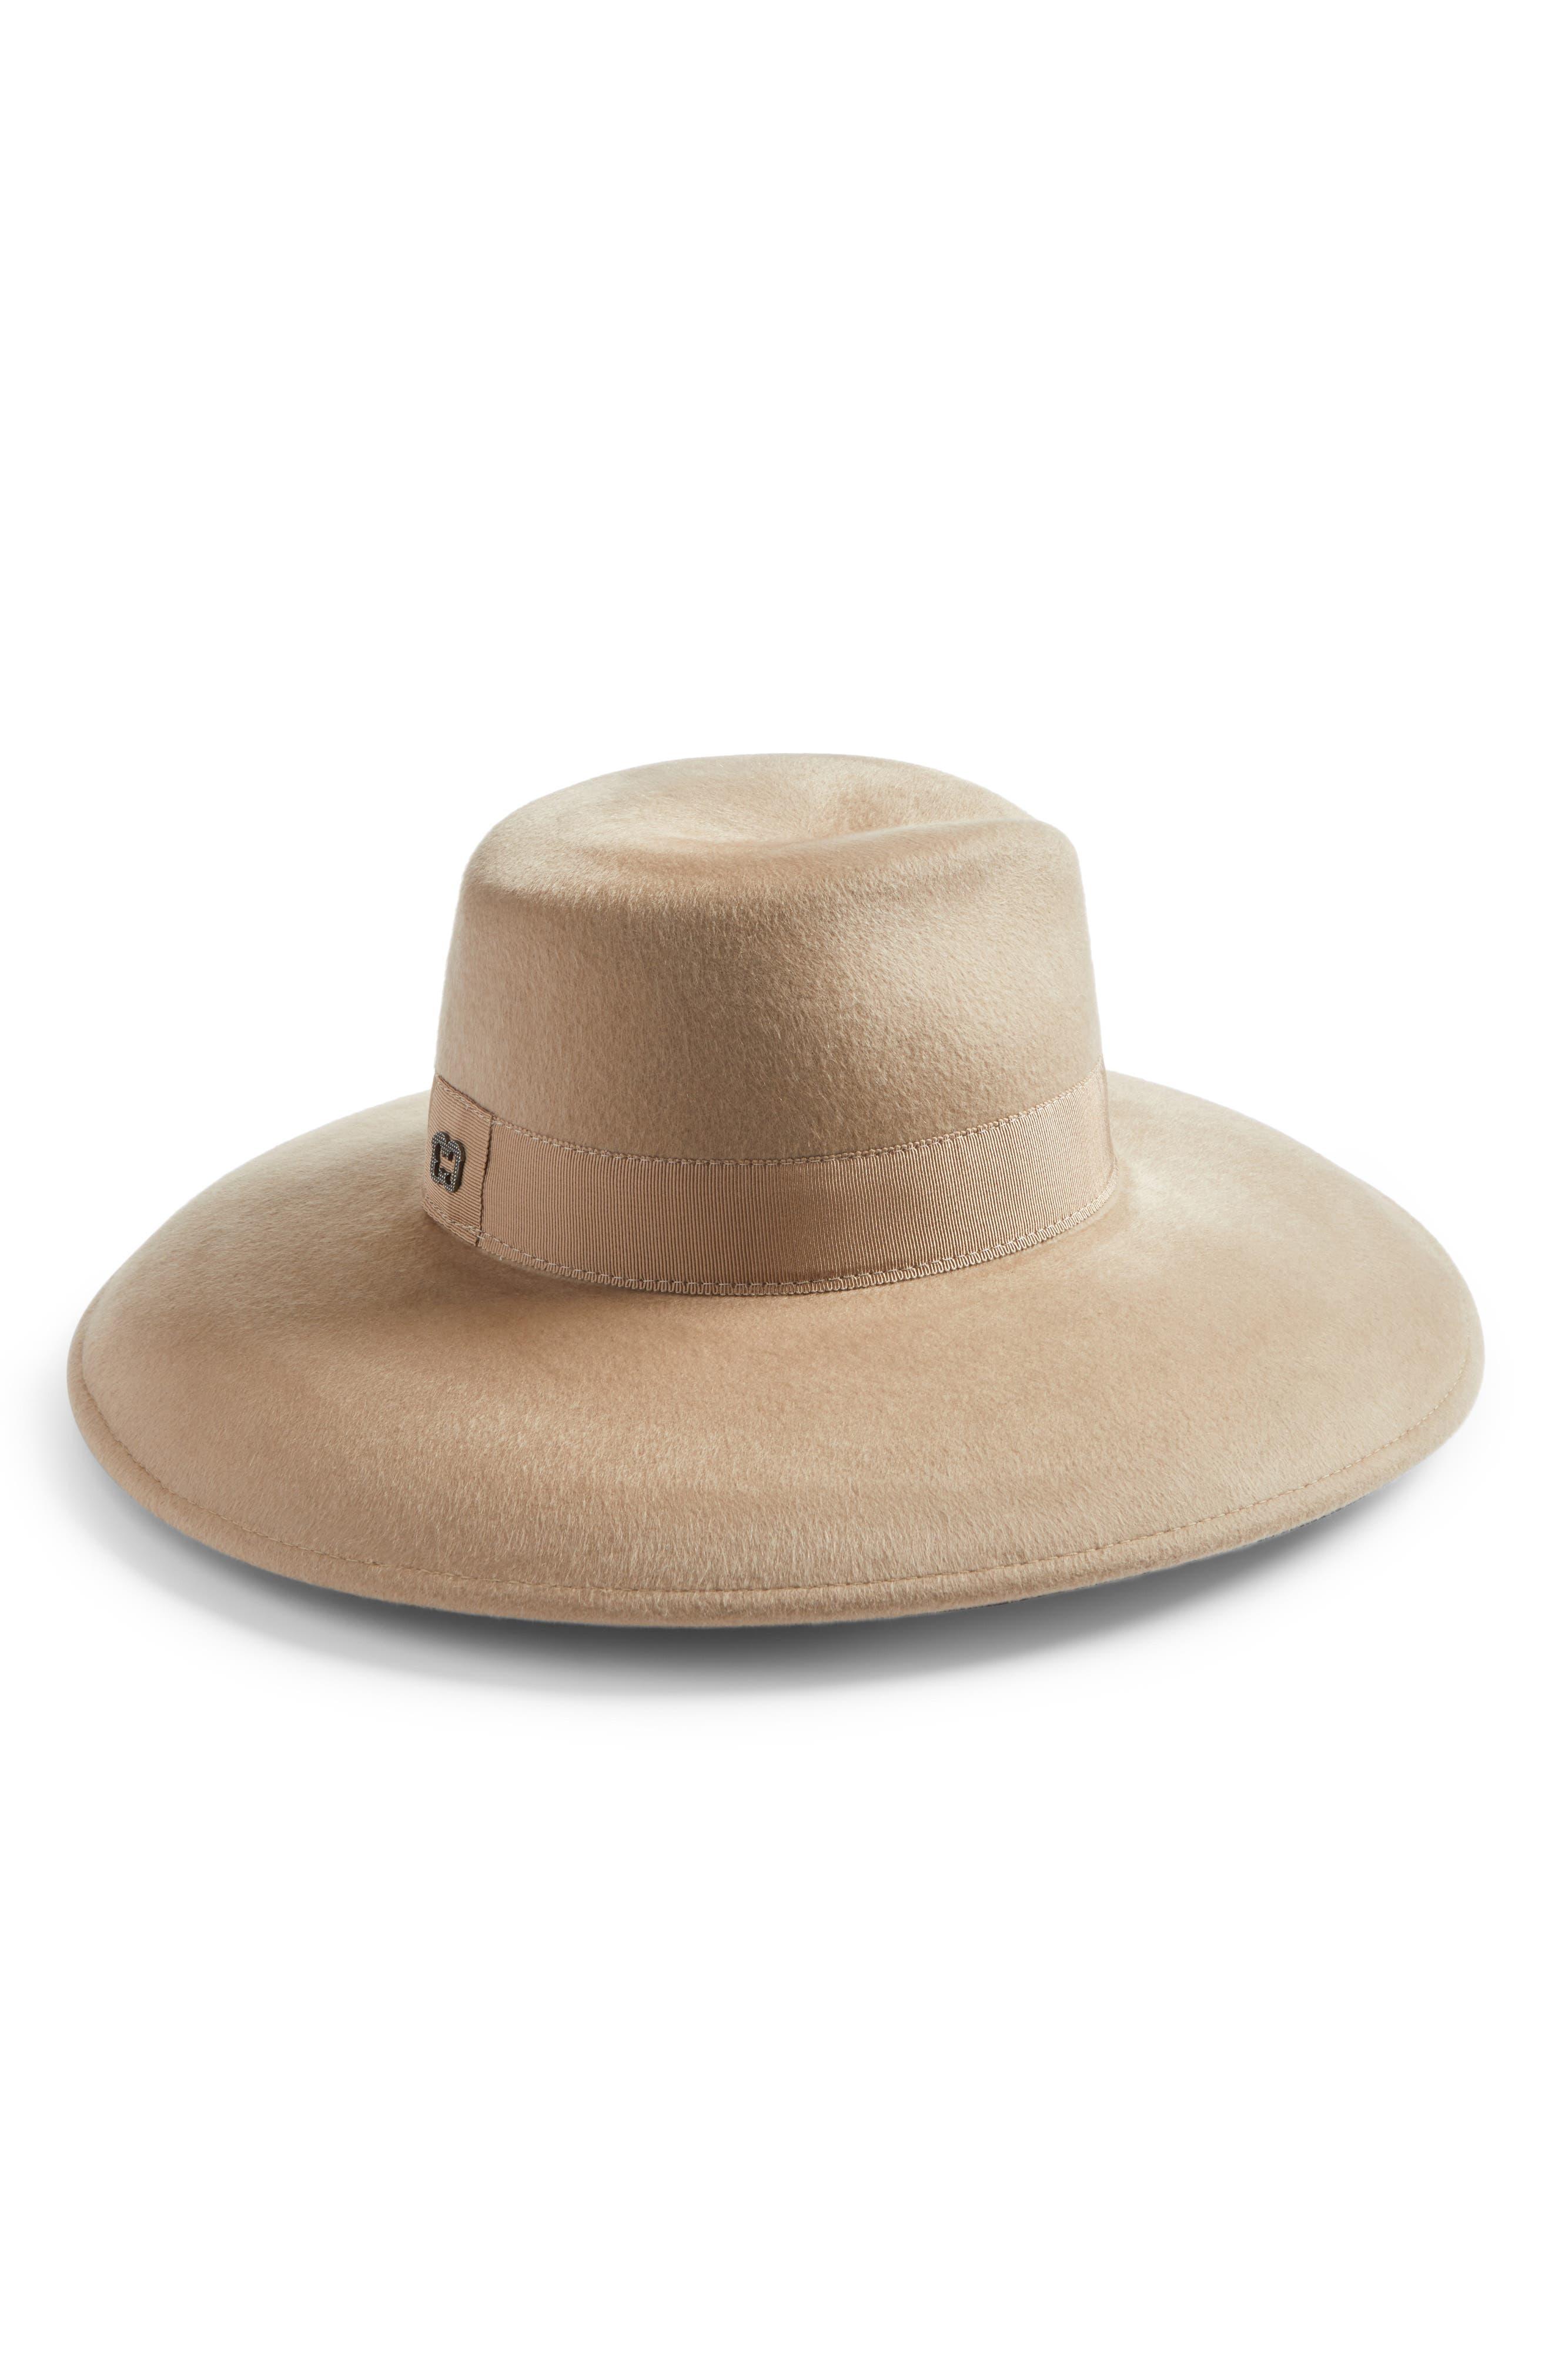 Alternate Image 1 Selected - Eric Javits Camille Wool Floppy Hat